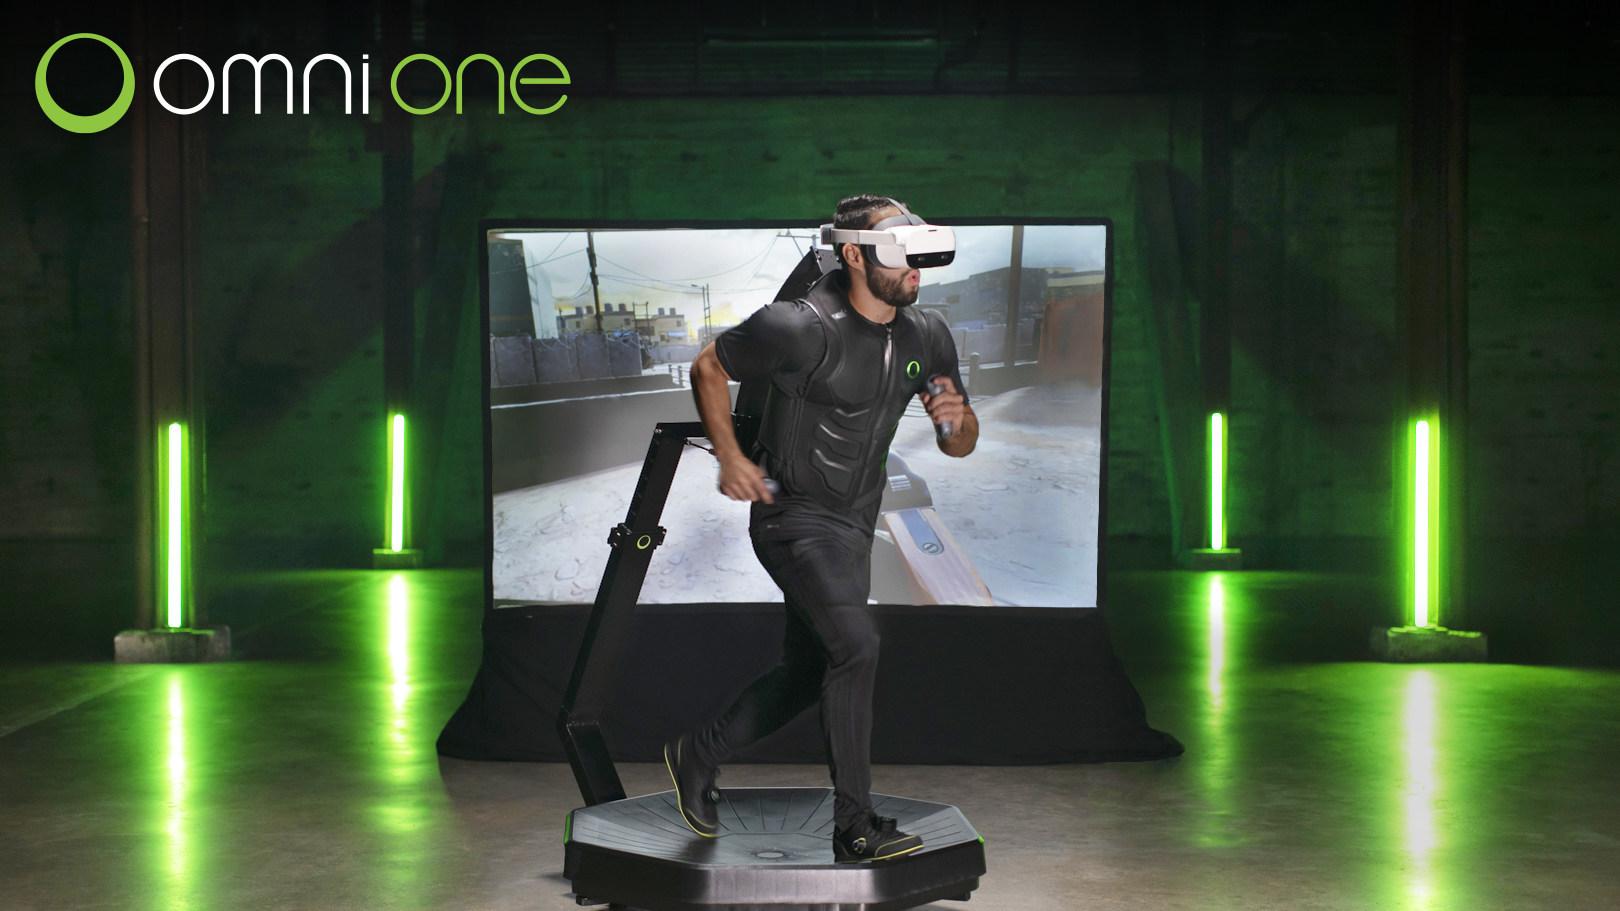 Omni One virtual reality treadmill raises over $11 million